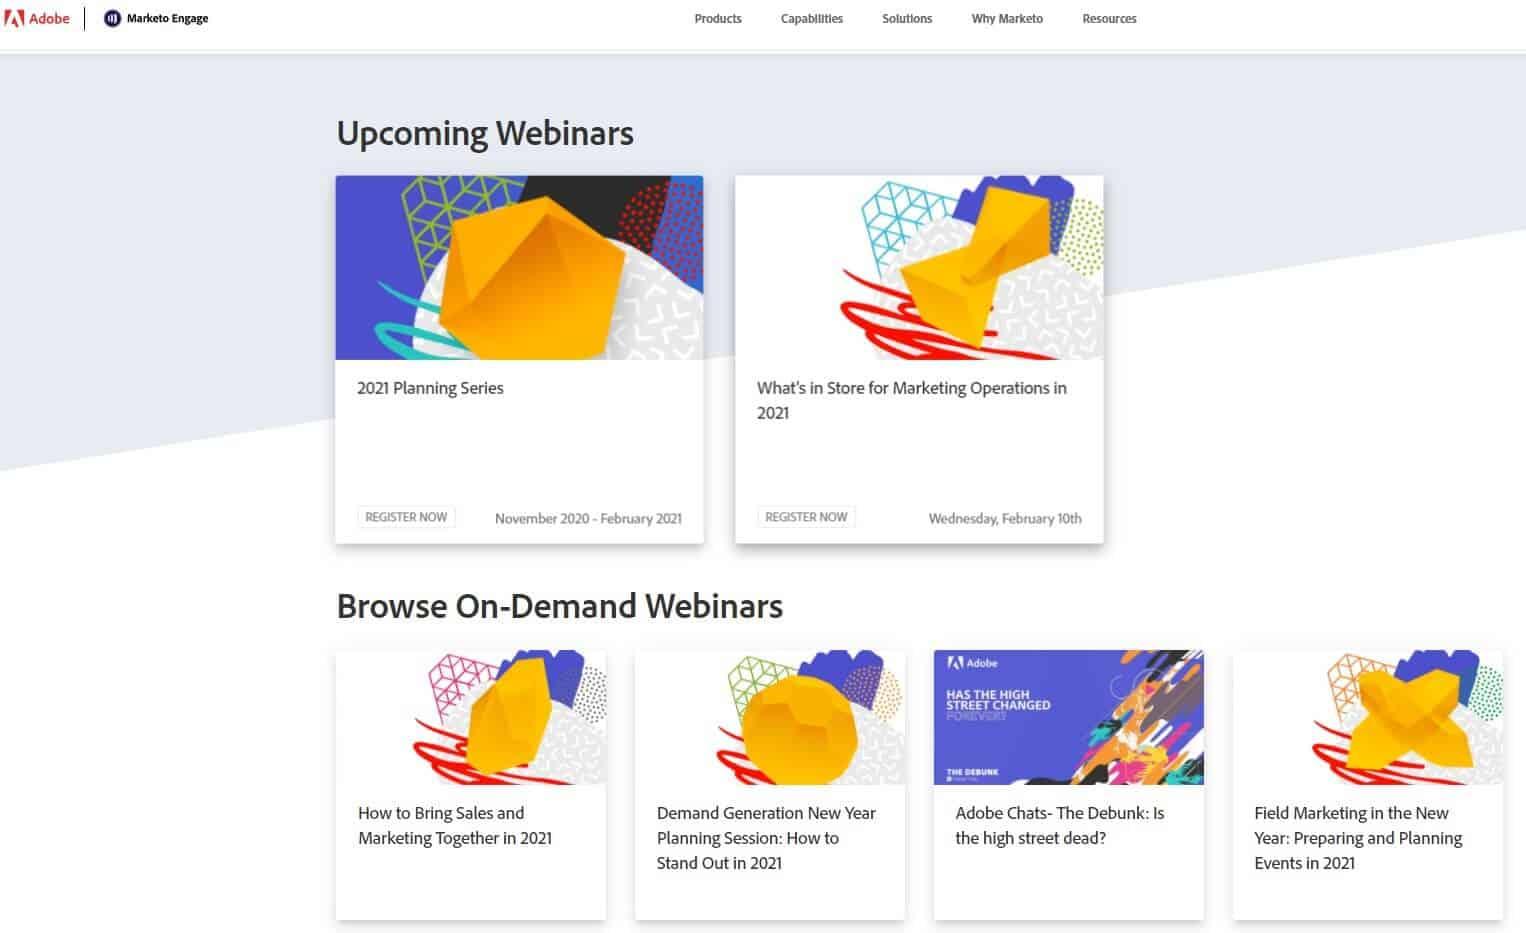 marketo webinars upcoming and on-demand